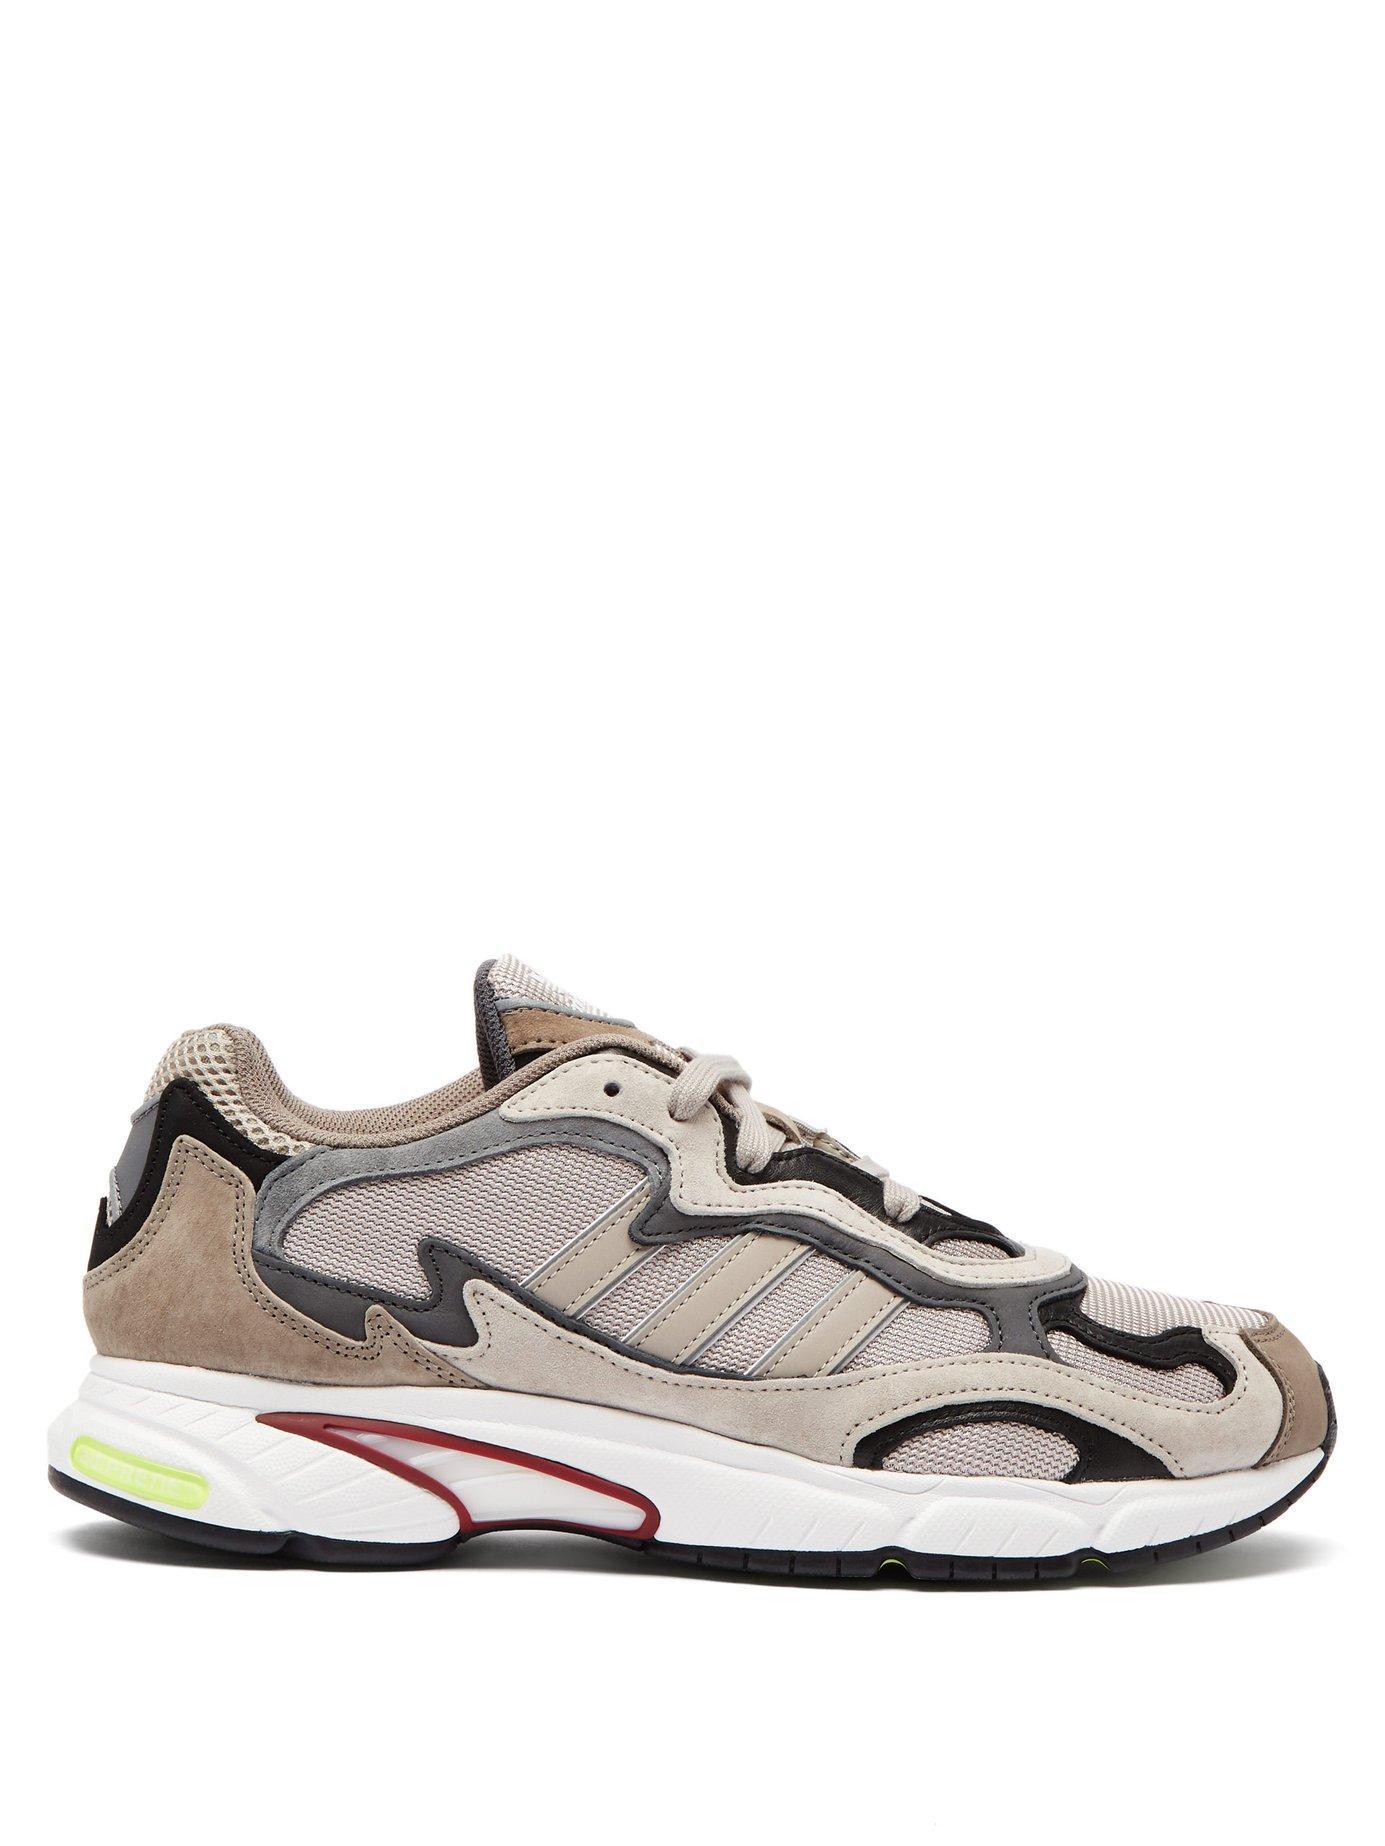 best cheap 393cf 73f37 adidas Originals. Men s Brown Temper Run Suede Low Top Trainers